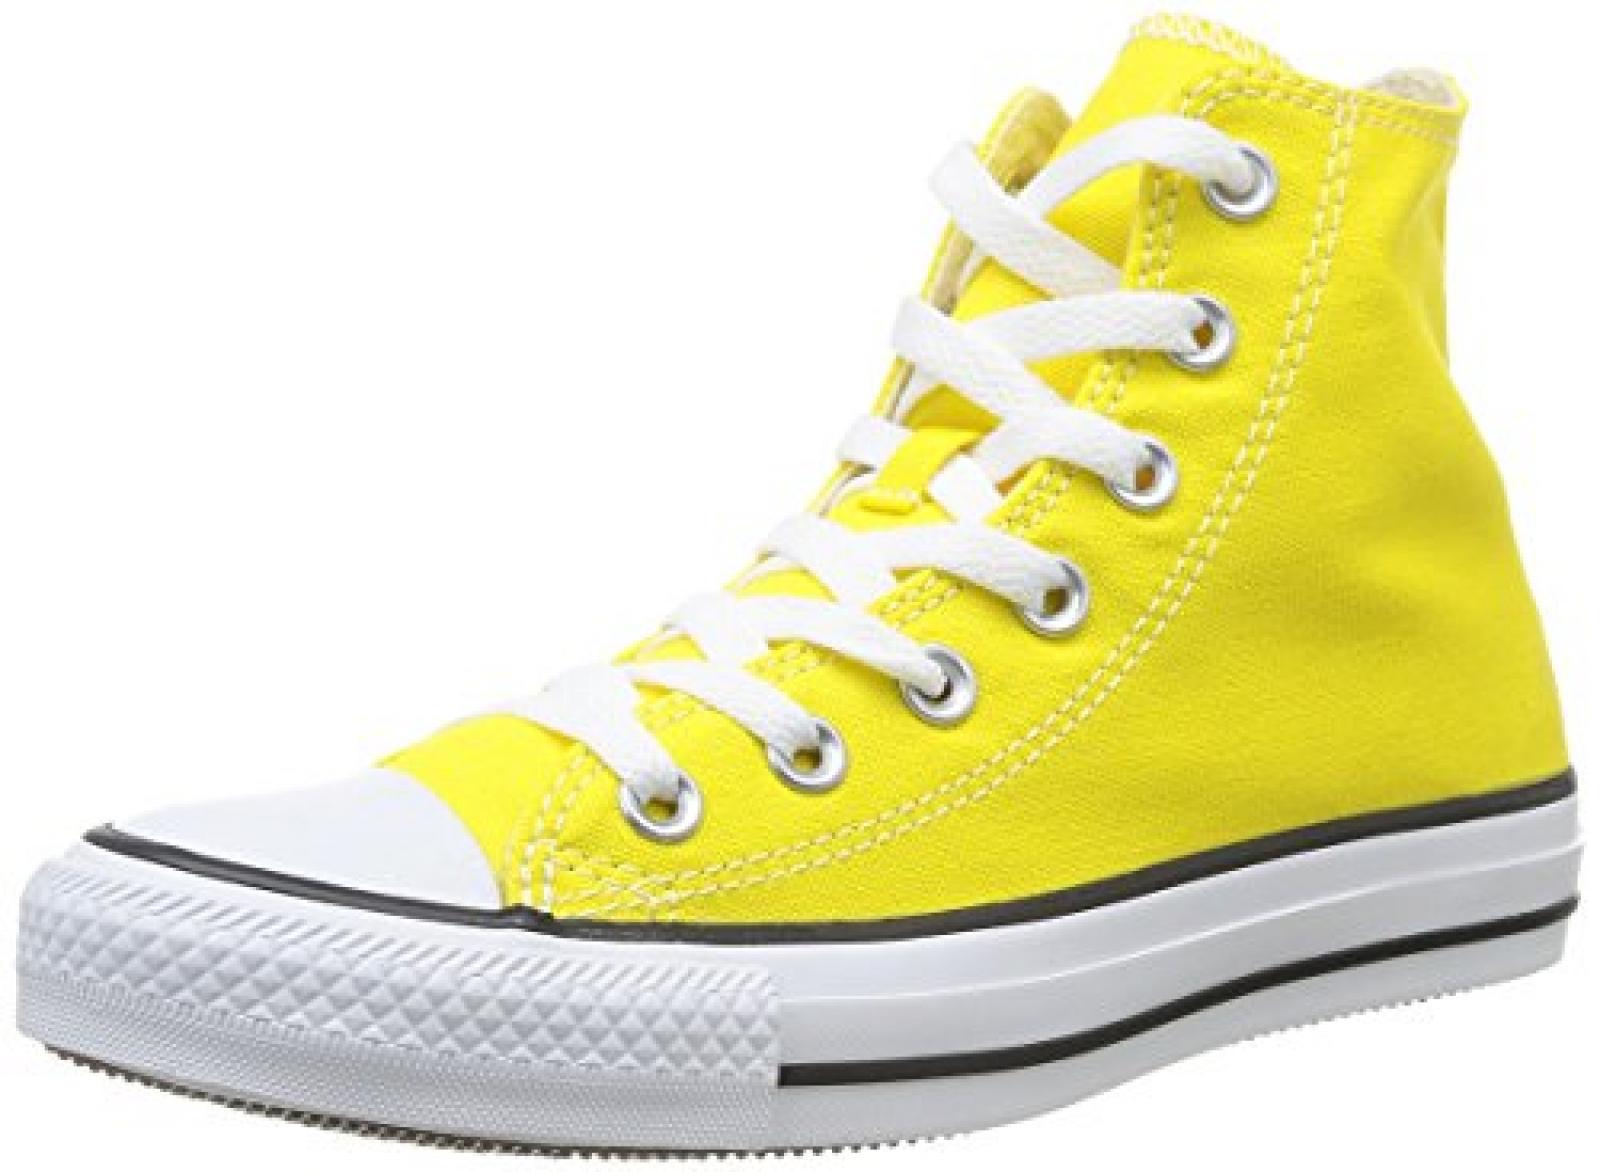 Converse Chuck Taylor All Star Hi, Unisex-Erwachsene Sneaker